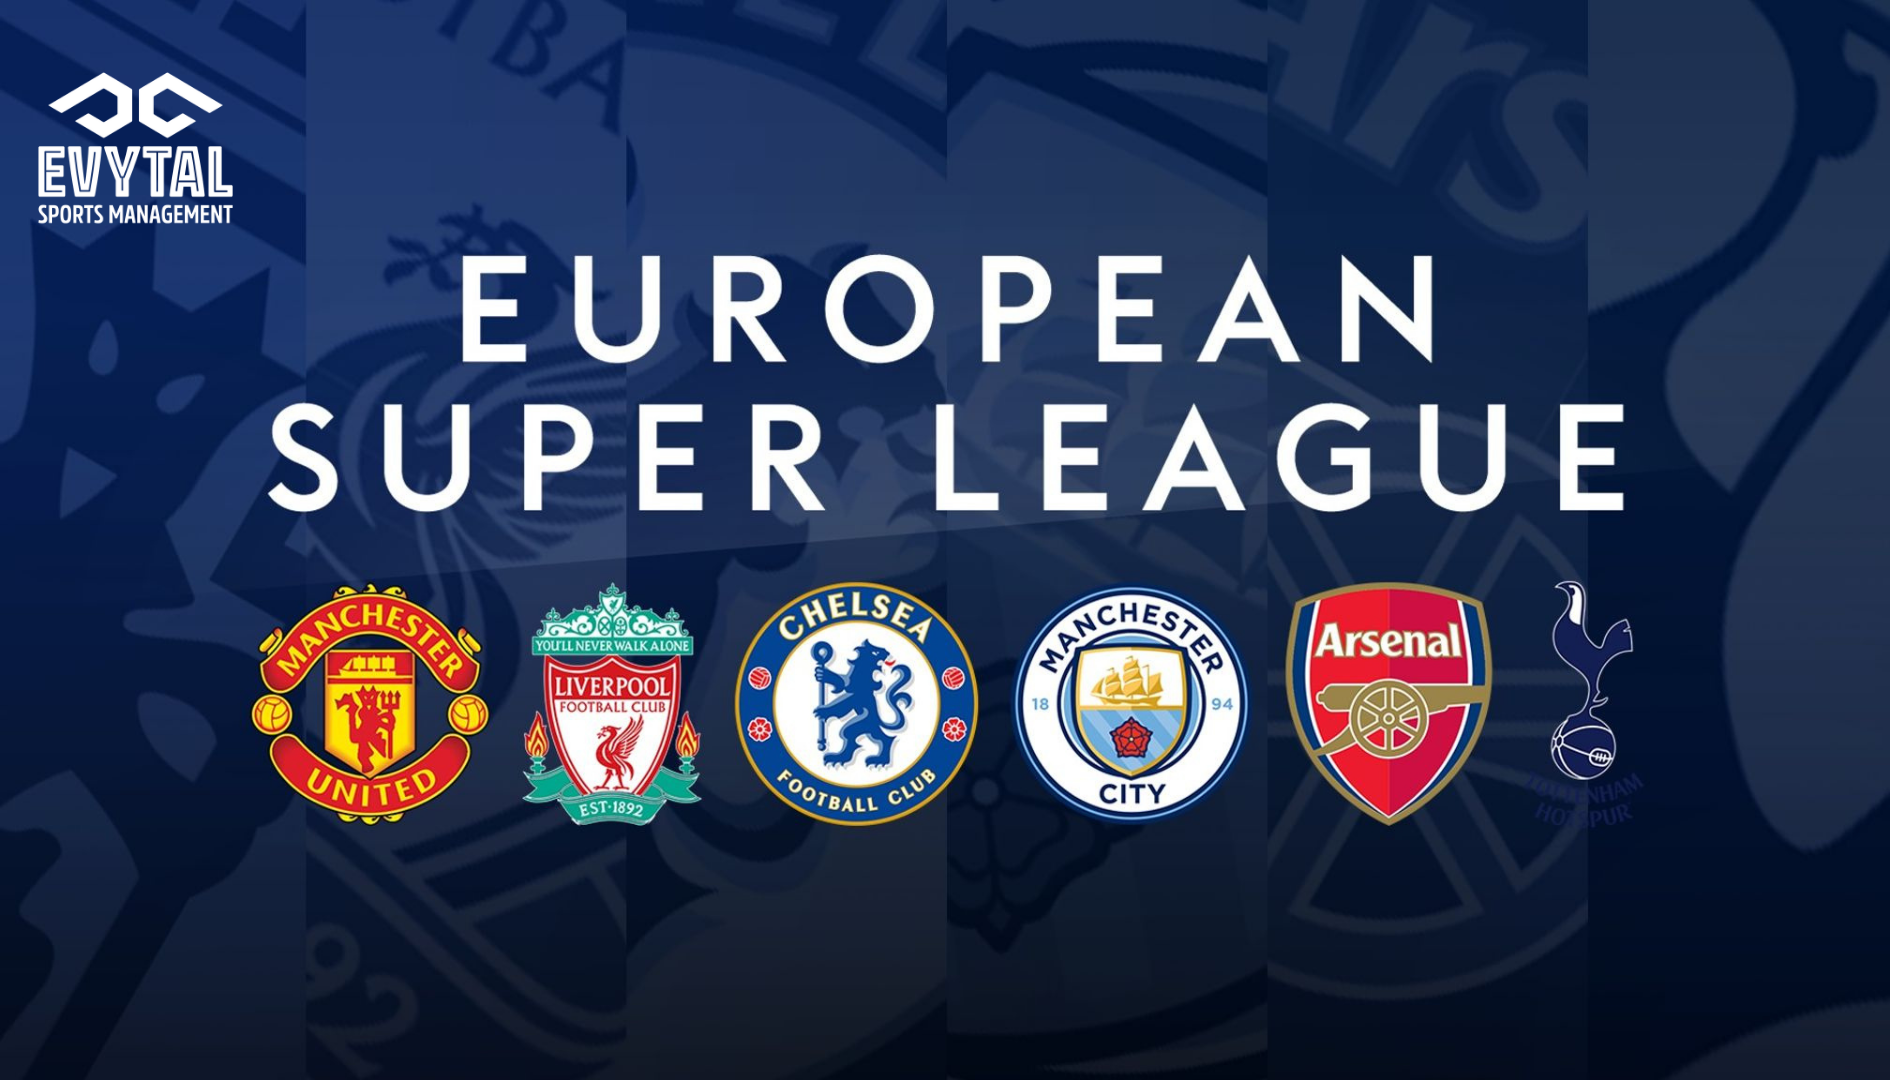 Super League: i club fondatori saranno esclusi da FIFA 22?